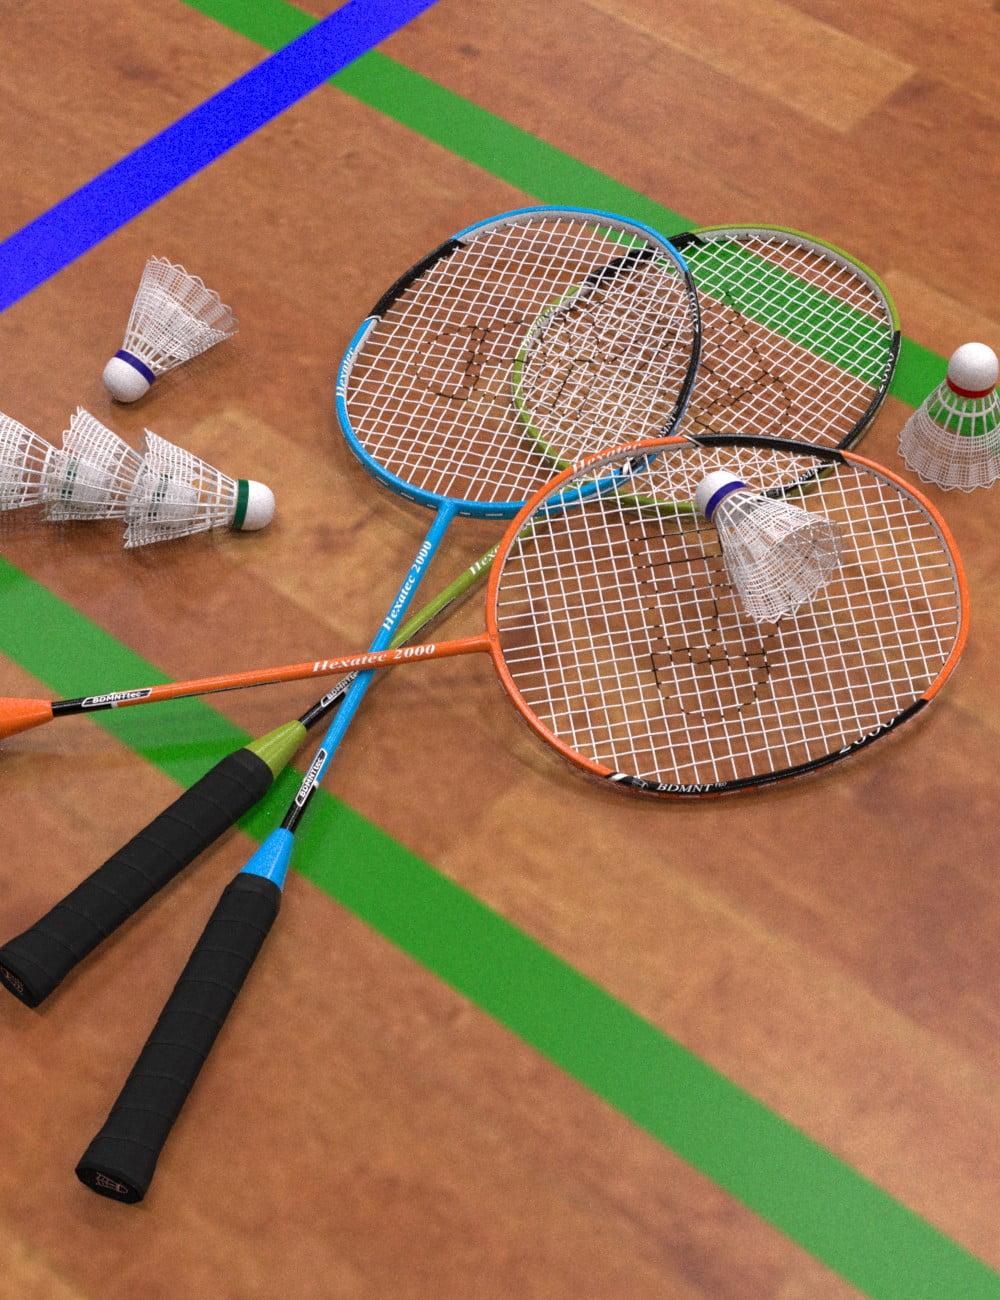 00-main-badminton-daz3d